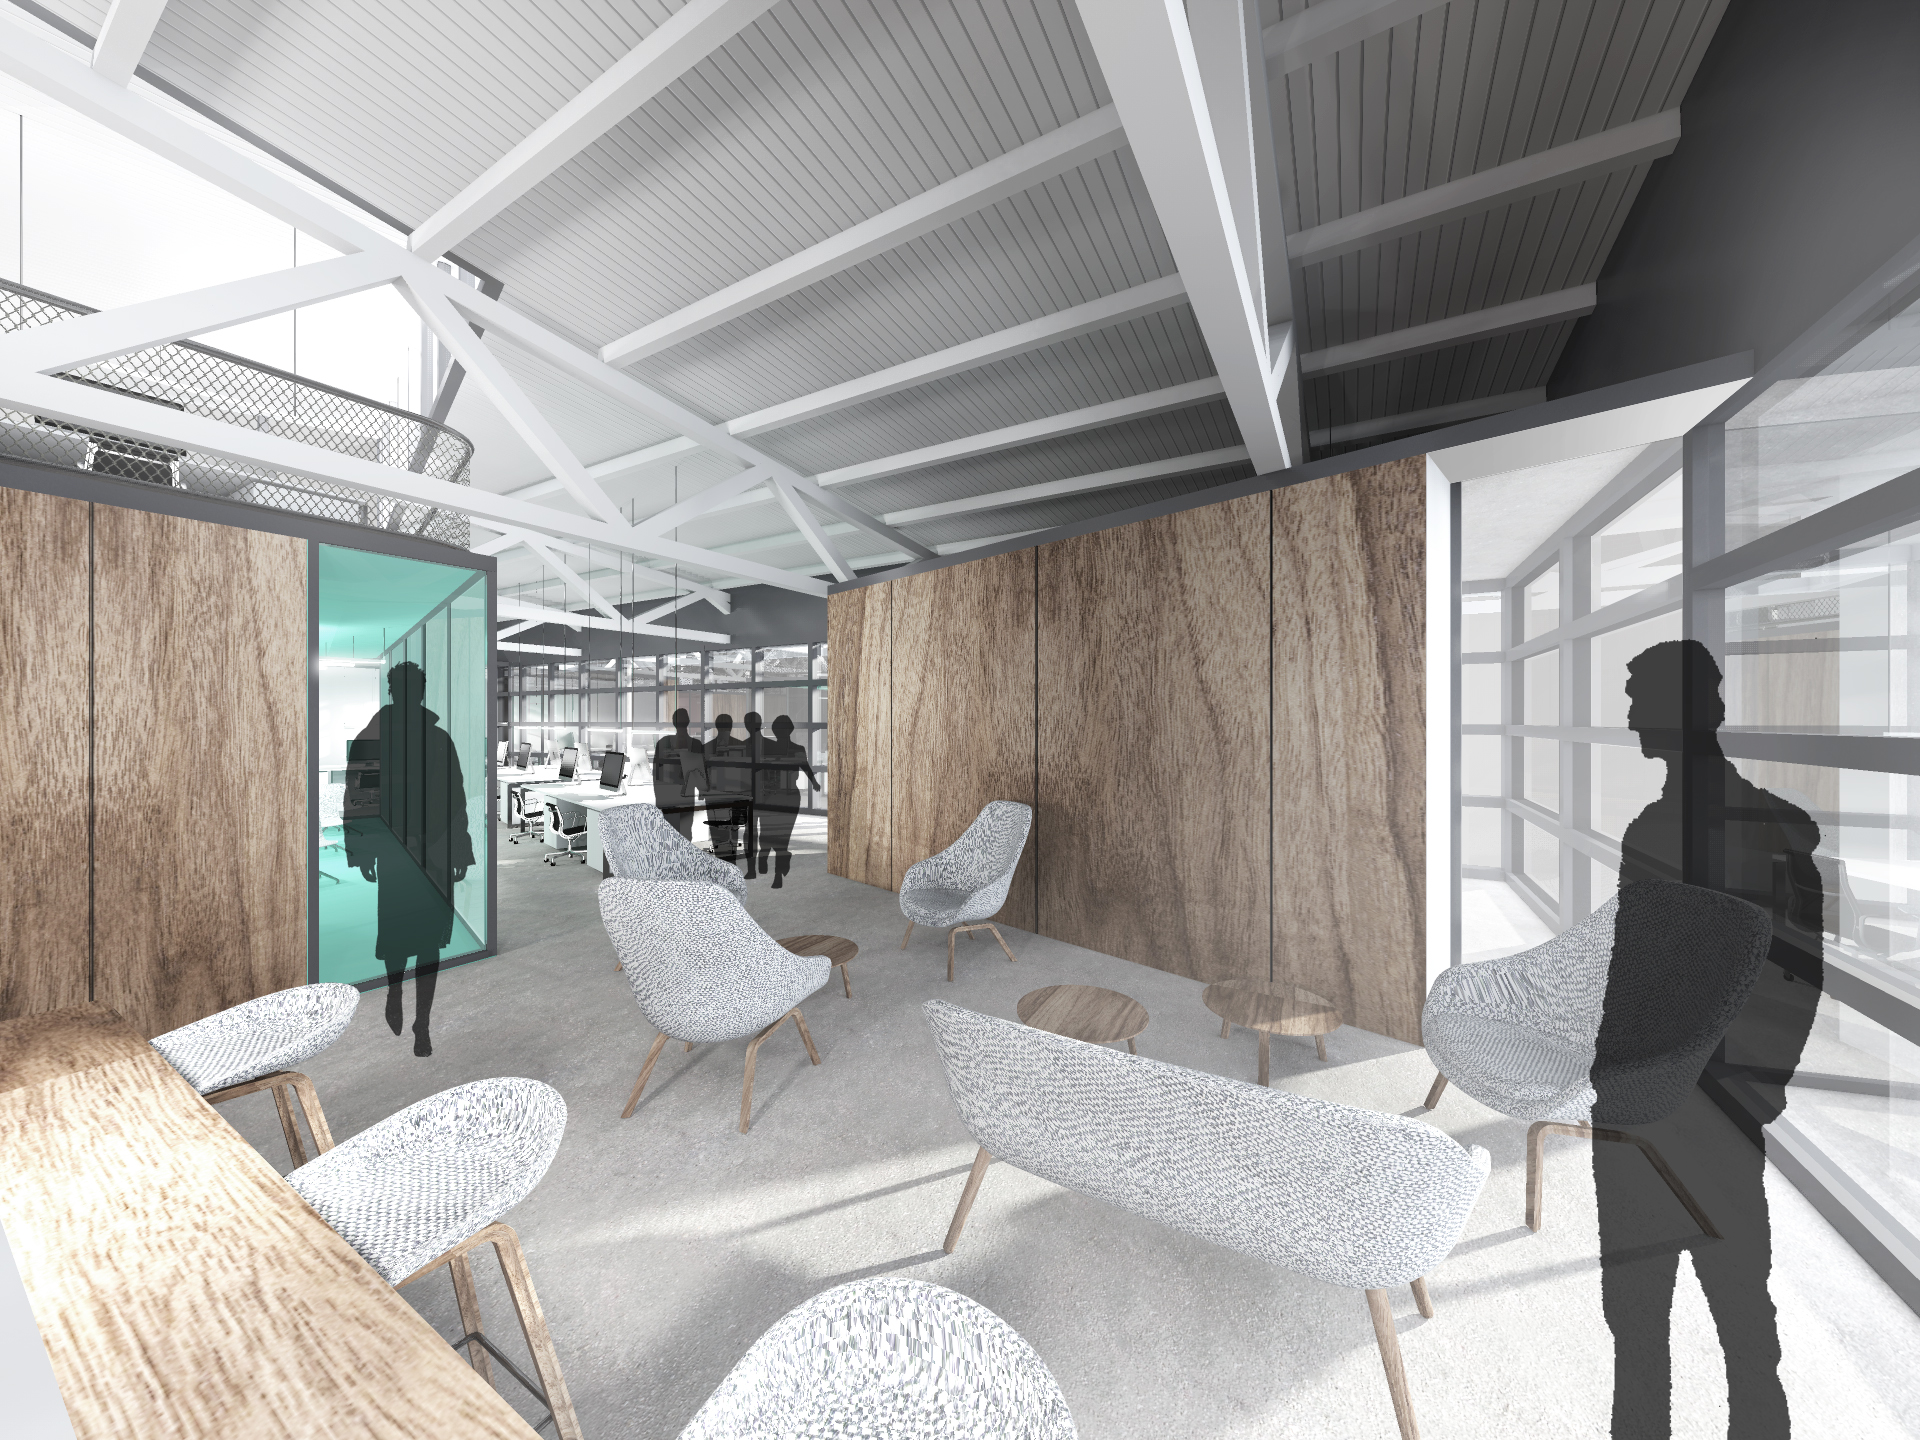 Sala Ferusic Architects Workflow Carles Sala Relja Ferusic